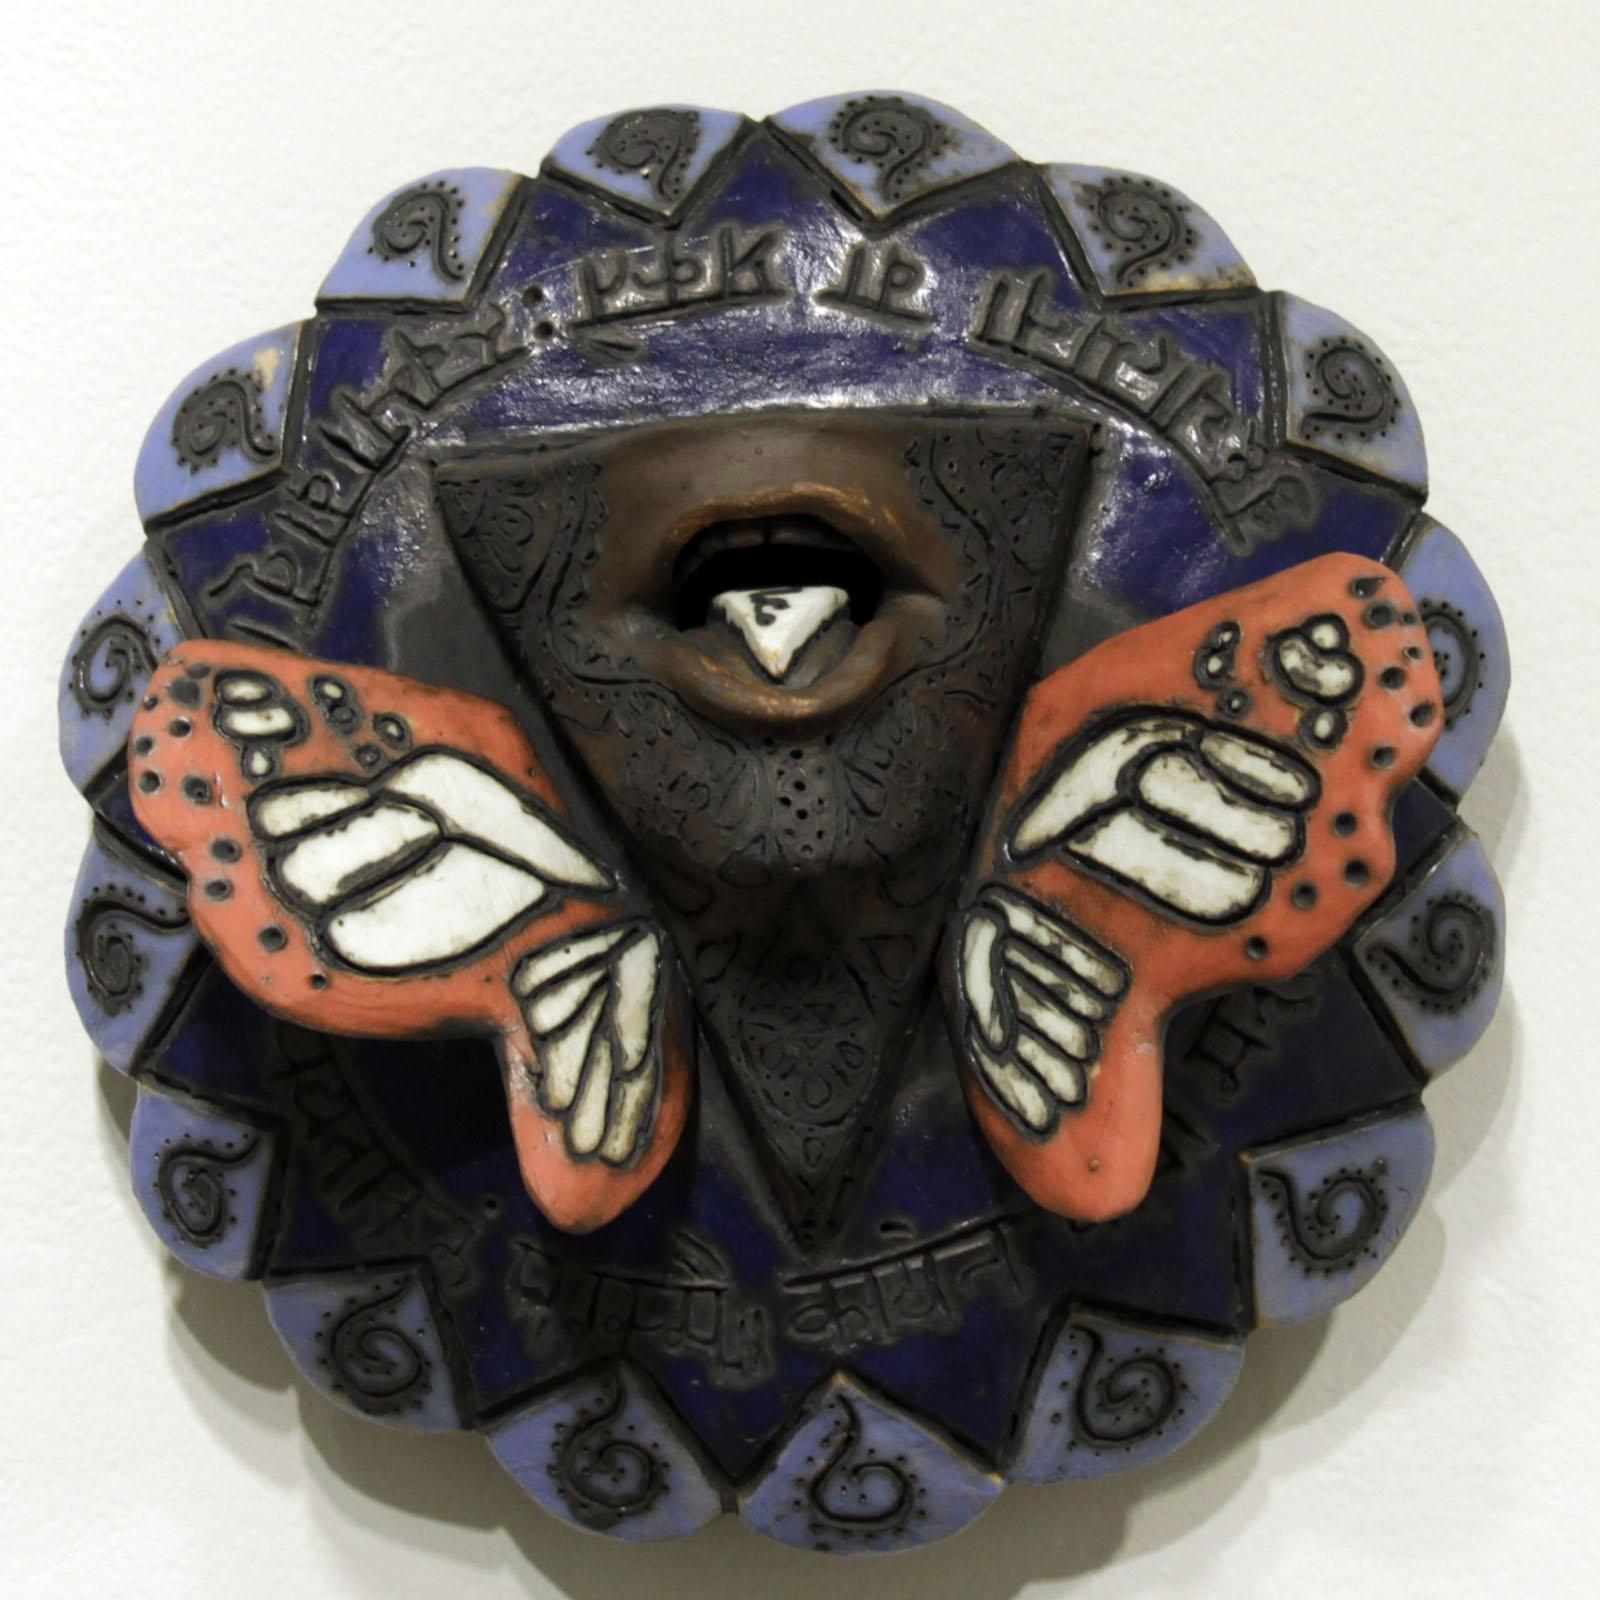 Visuddha   12 inches in diameter / ceramic and acrylic